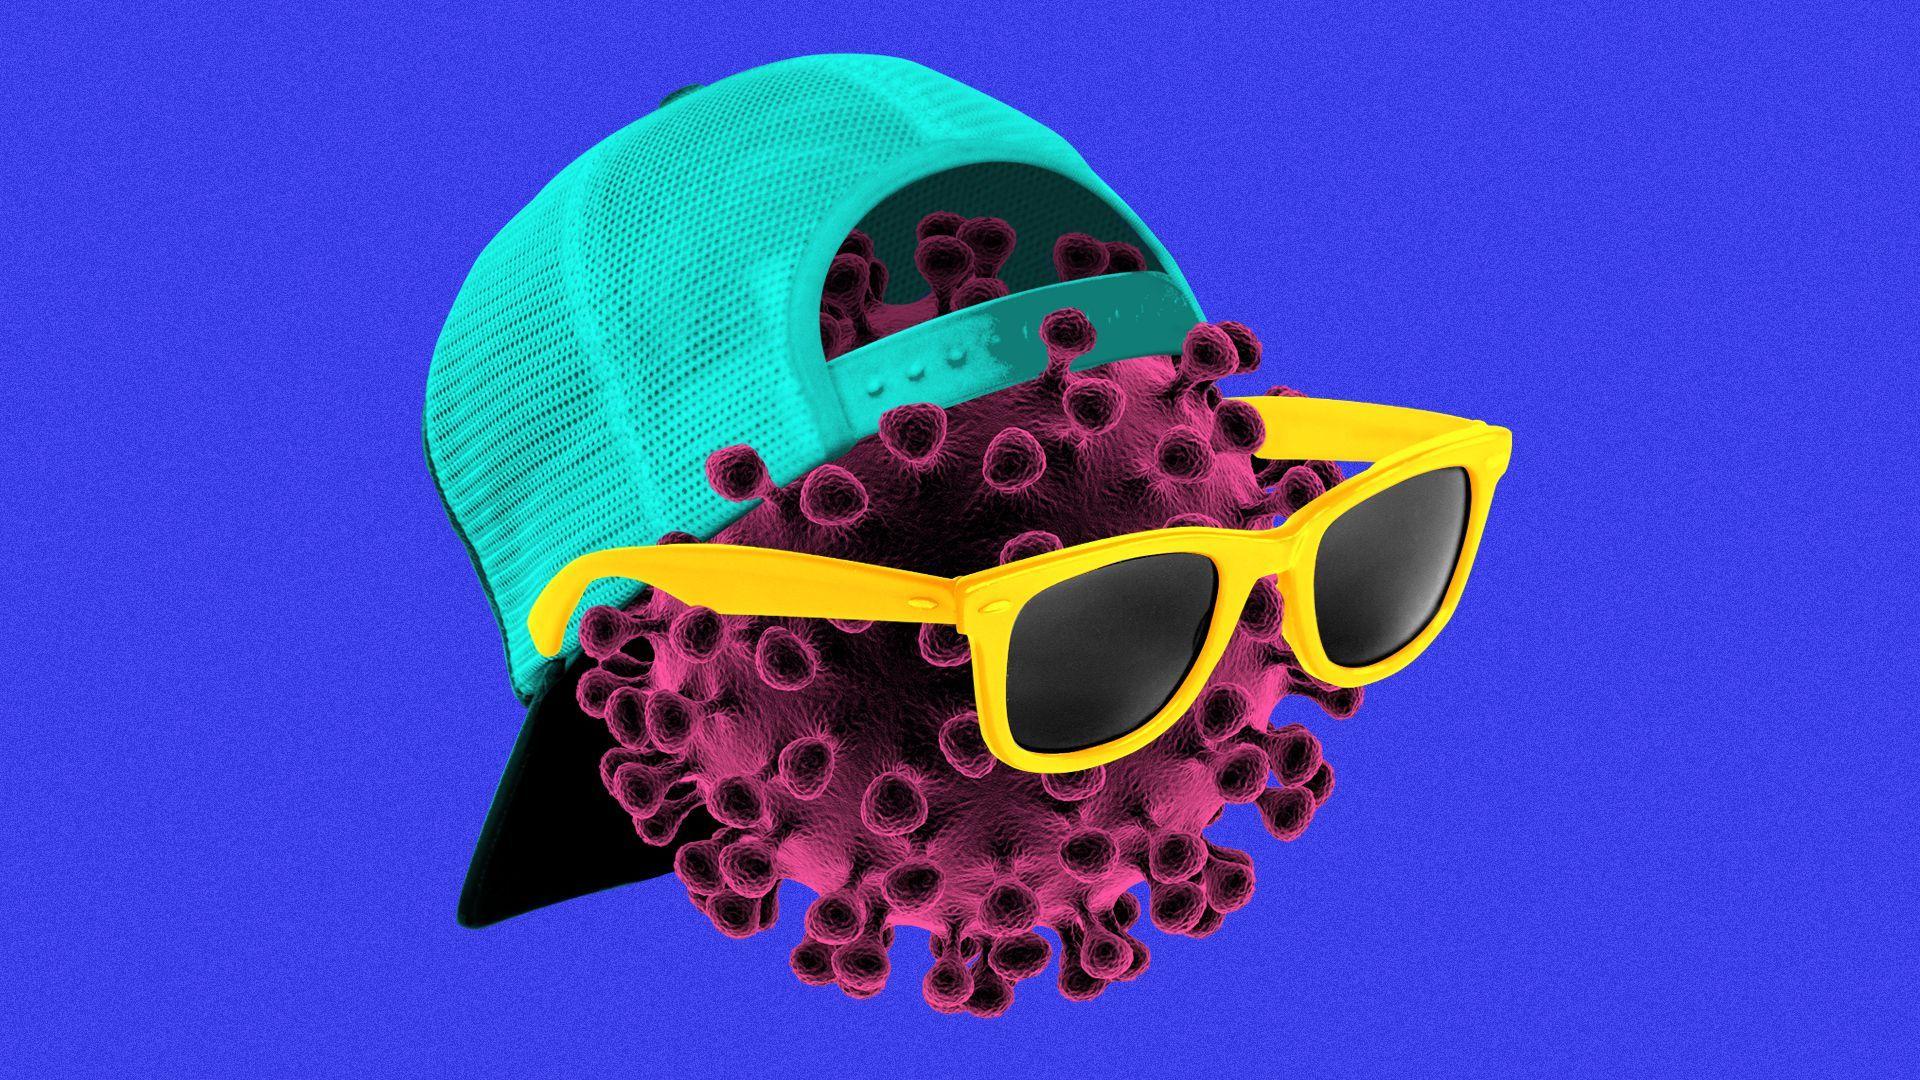 Illustration of a coronavirus particle wearing a backwards baseball hat and sunglasses.